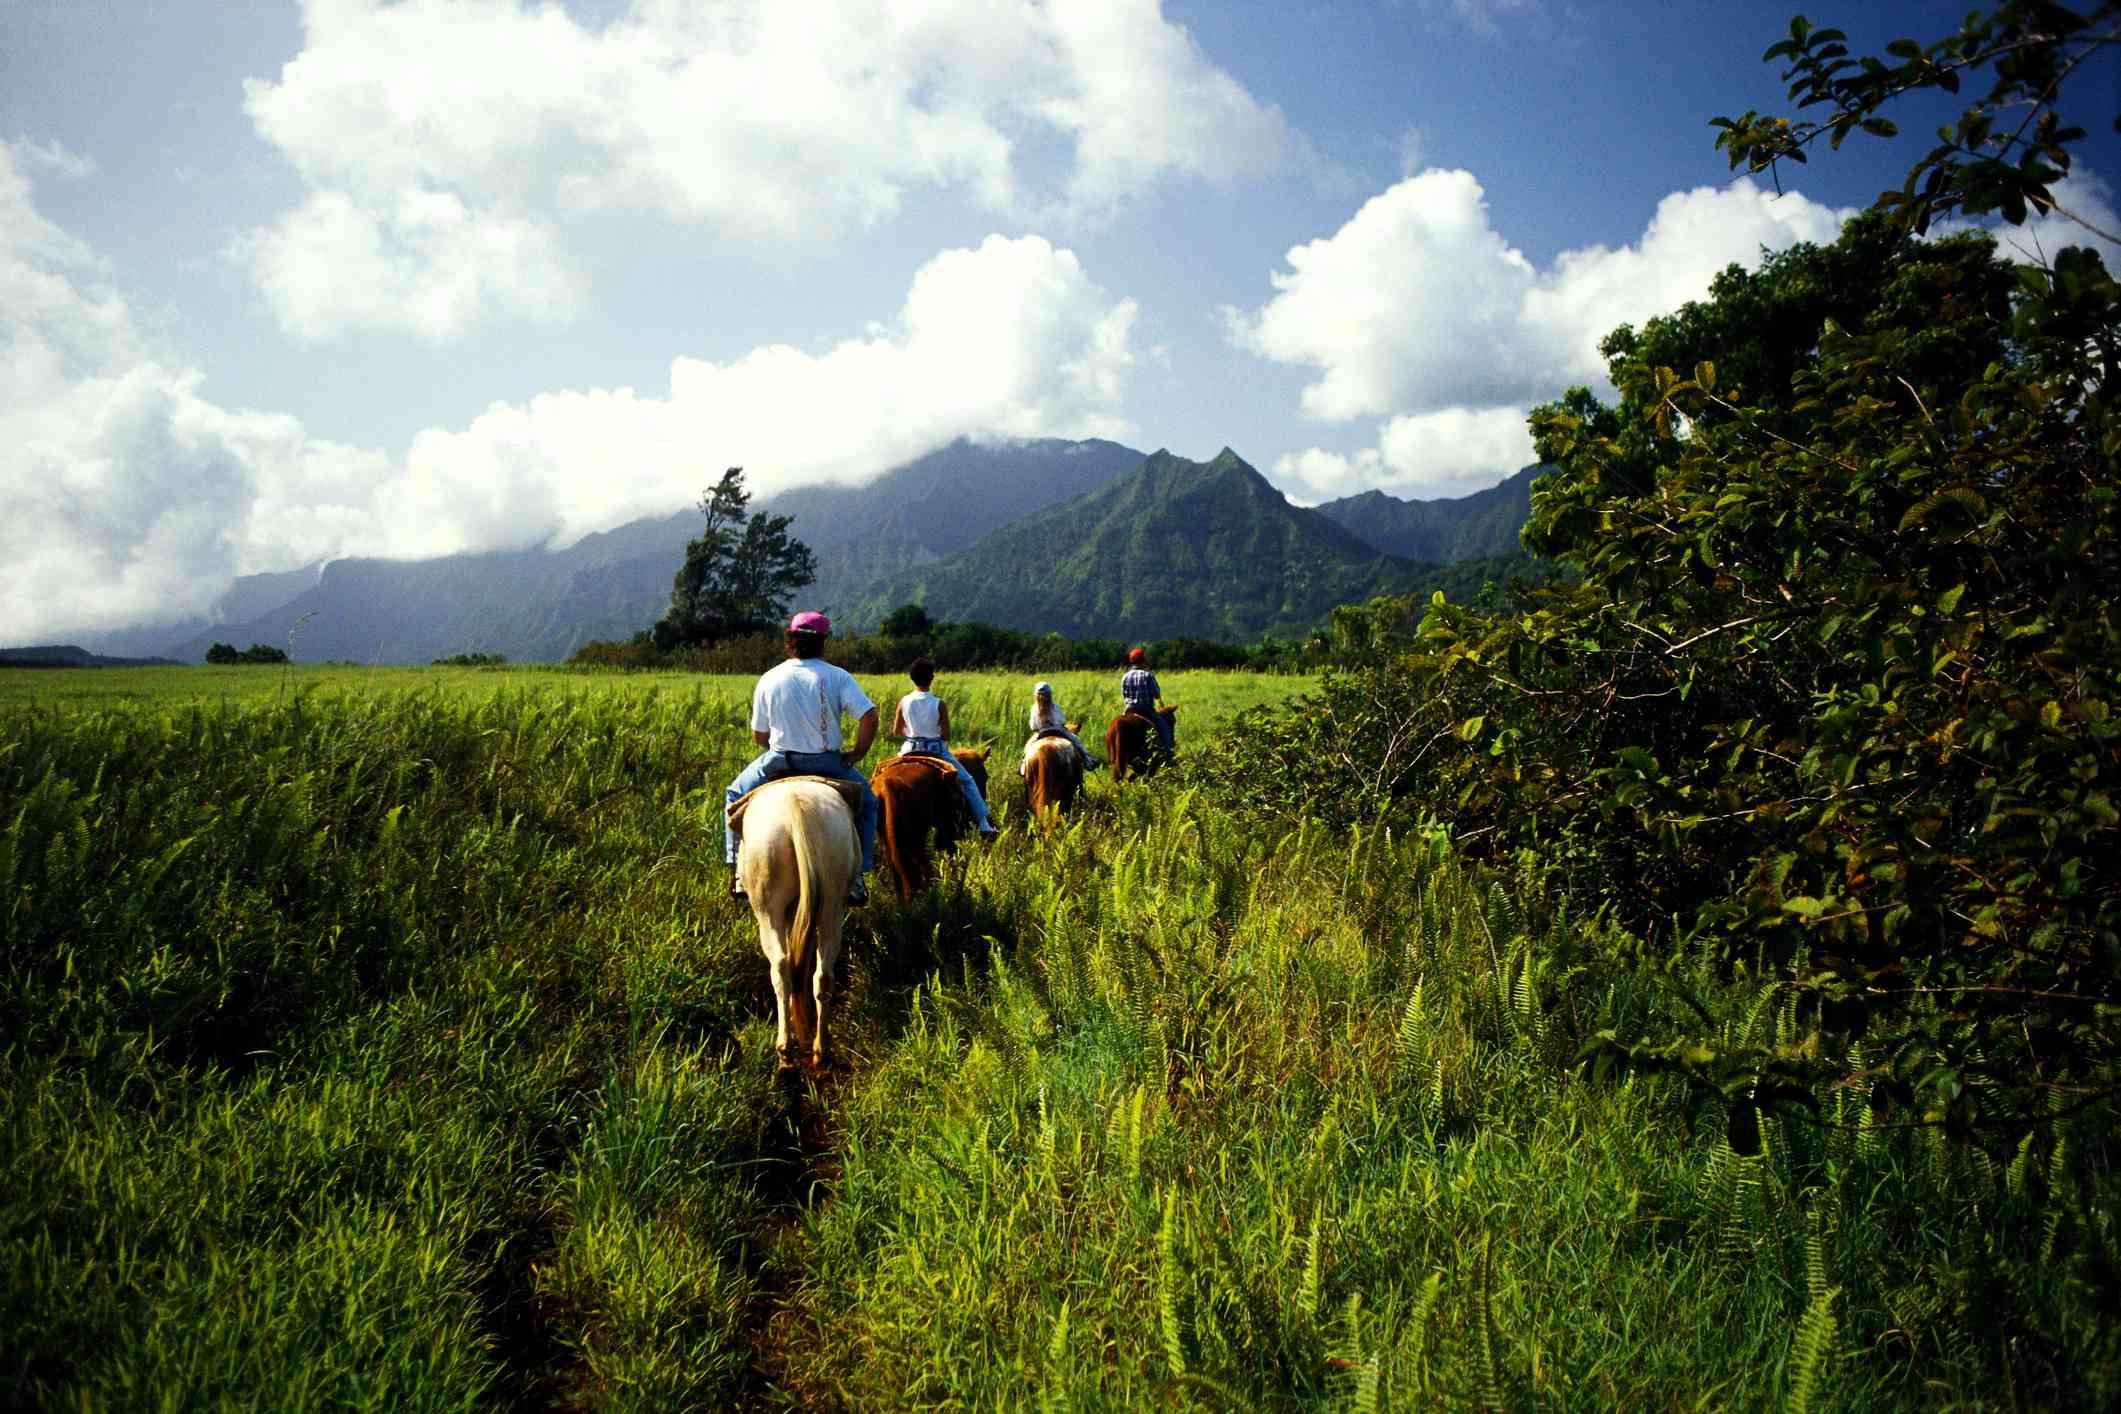 horseback riding in hanalei, view from behind island of kauai, hawaii